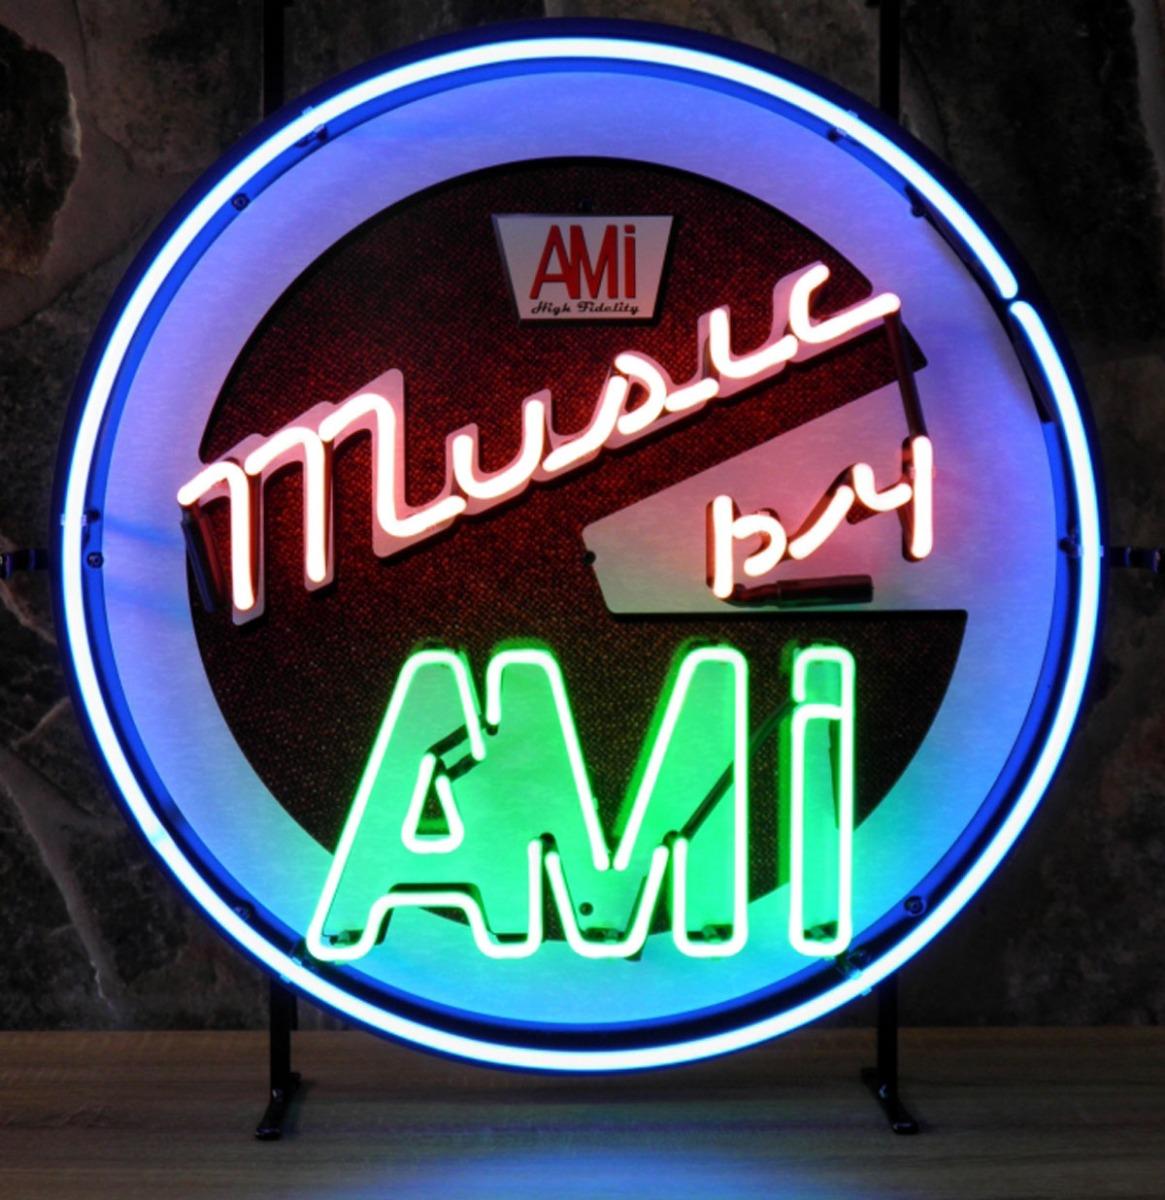 Music By AMI Neon Verlichting Met Achterplaat - 60 x 60 cm